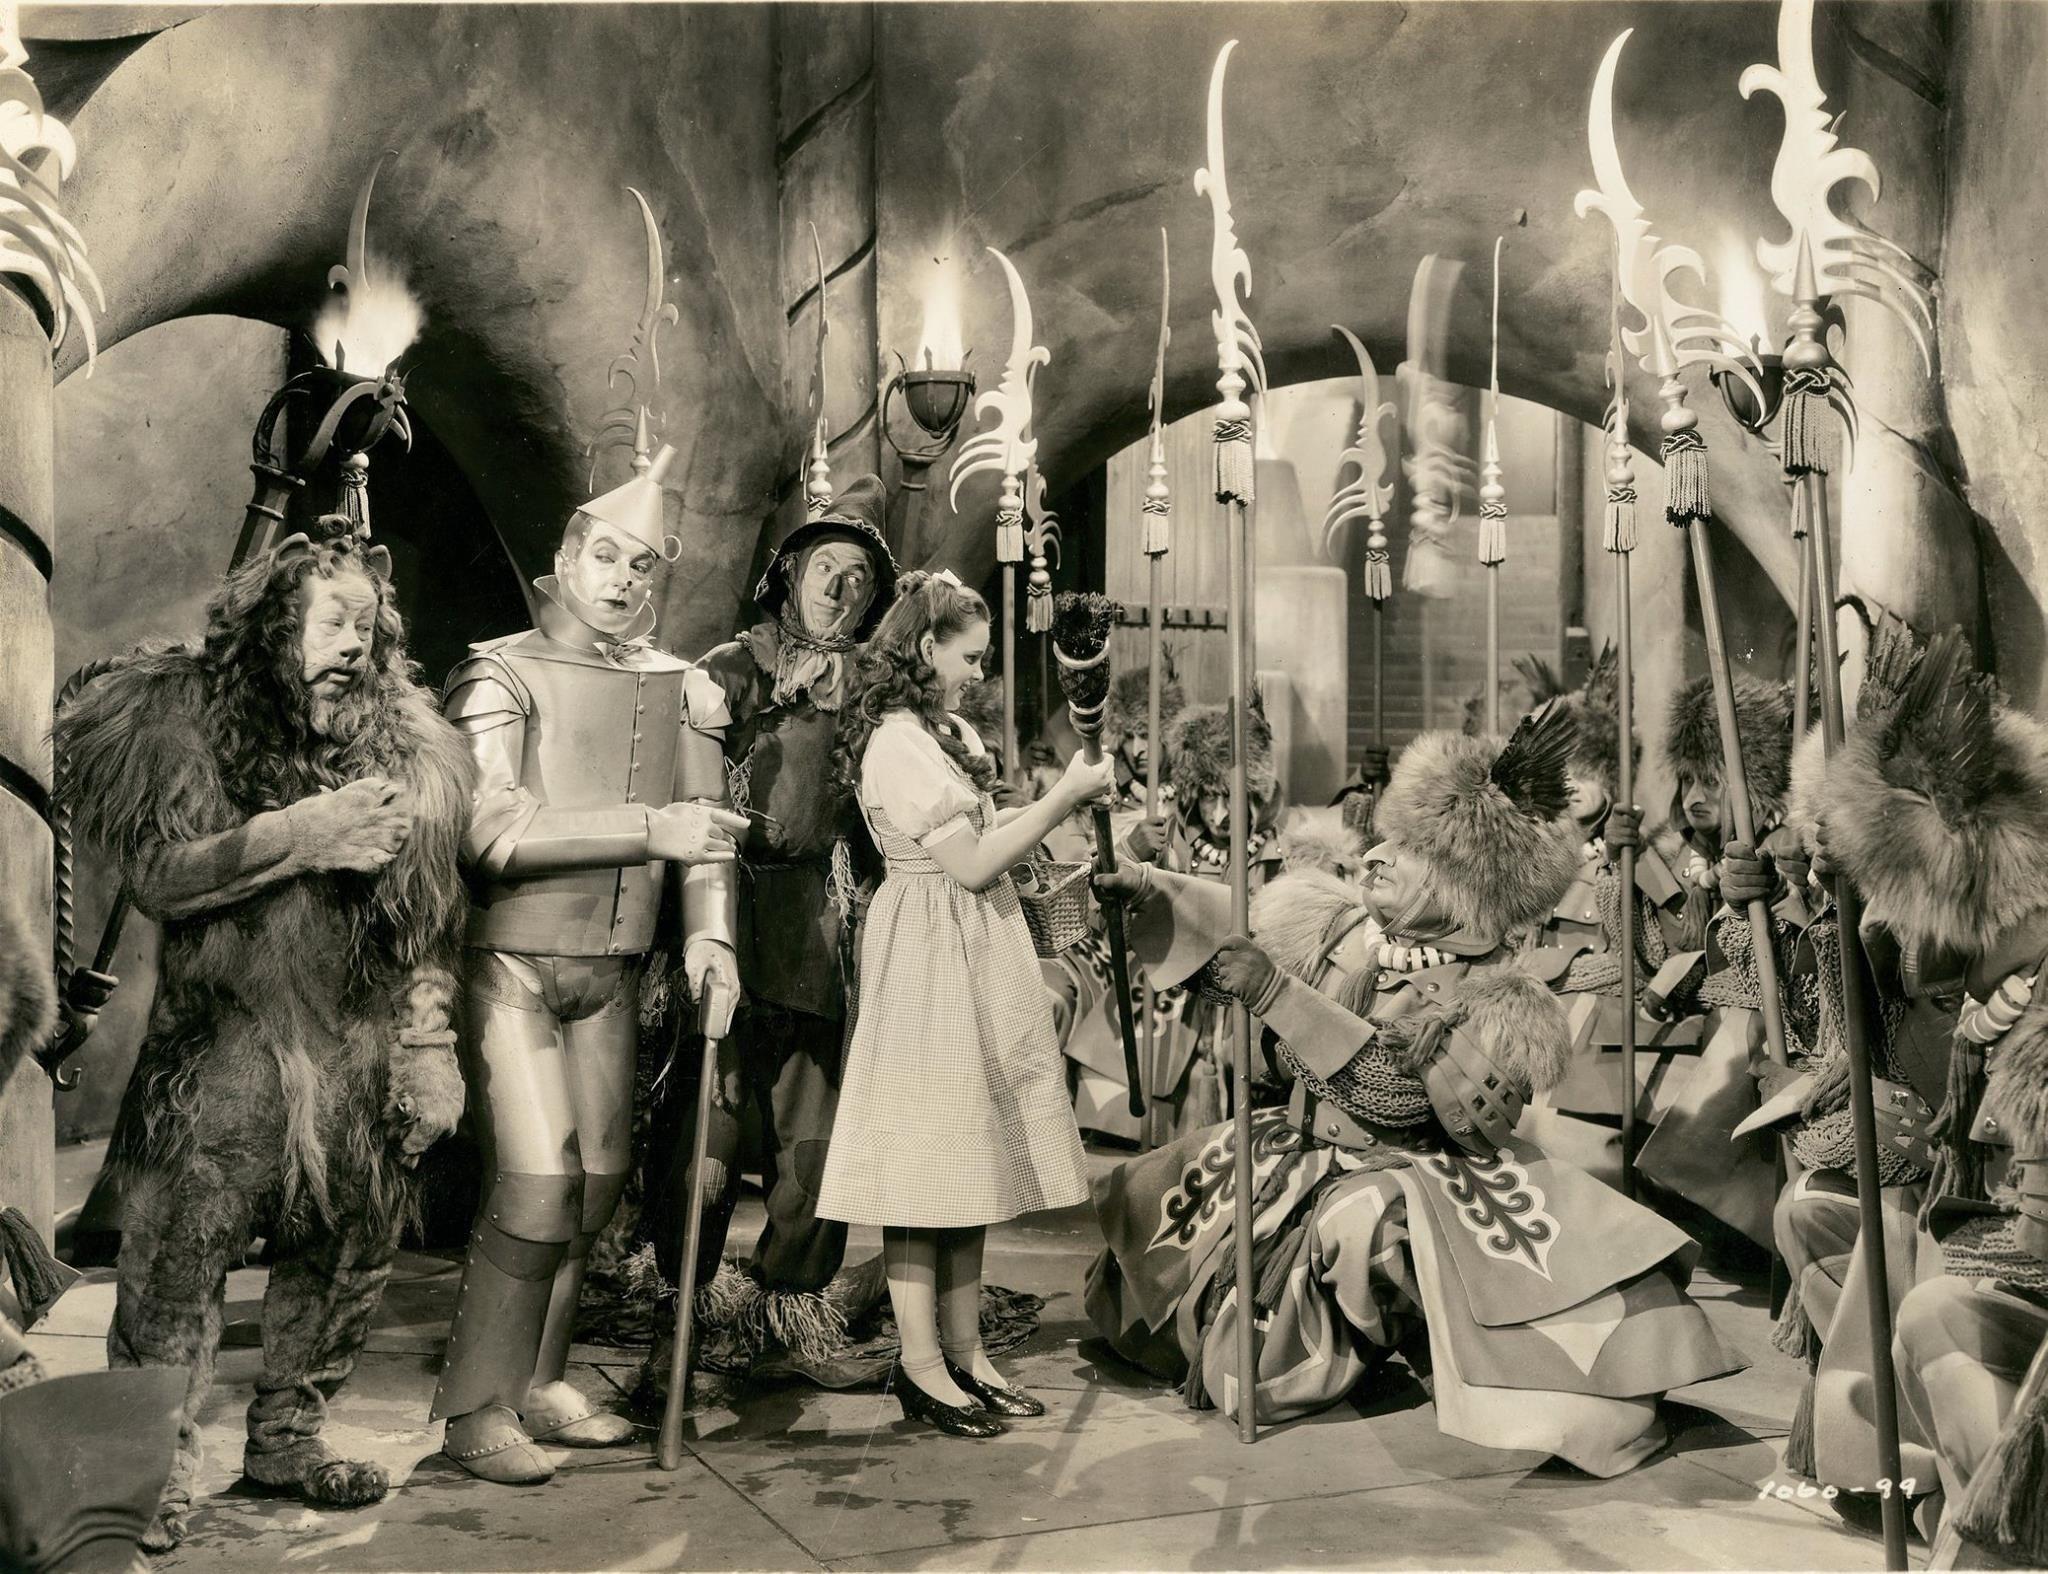 The Wizard of Oz DVD 1939 Óz a csodák csodája / Directed